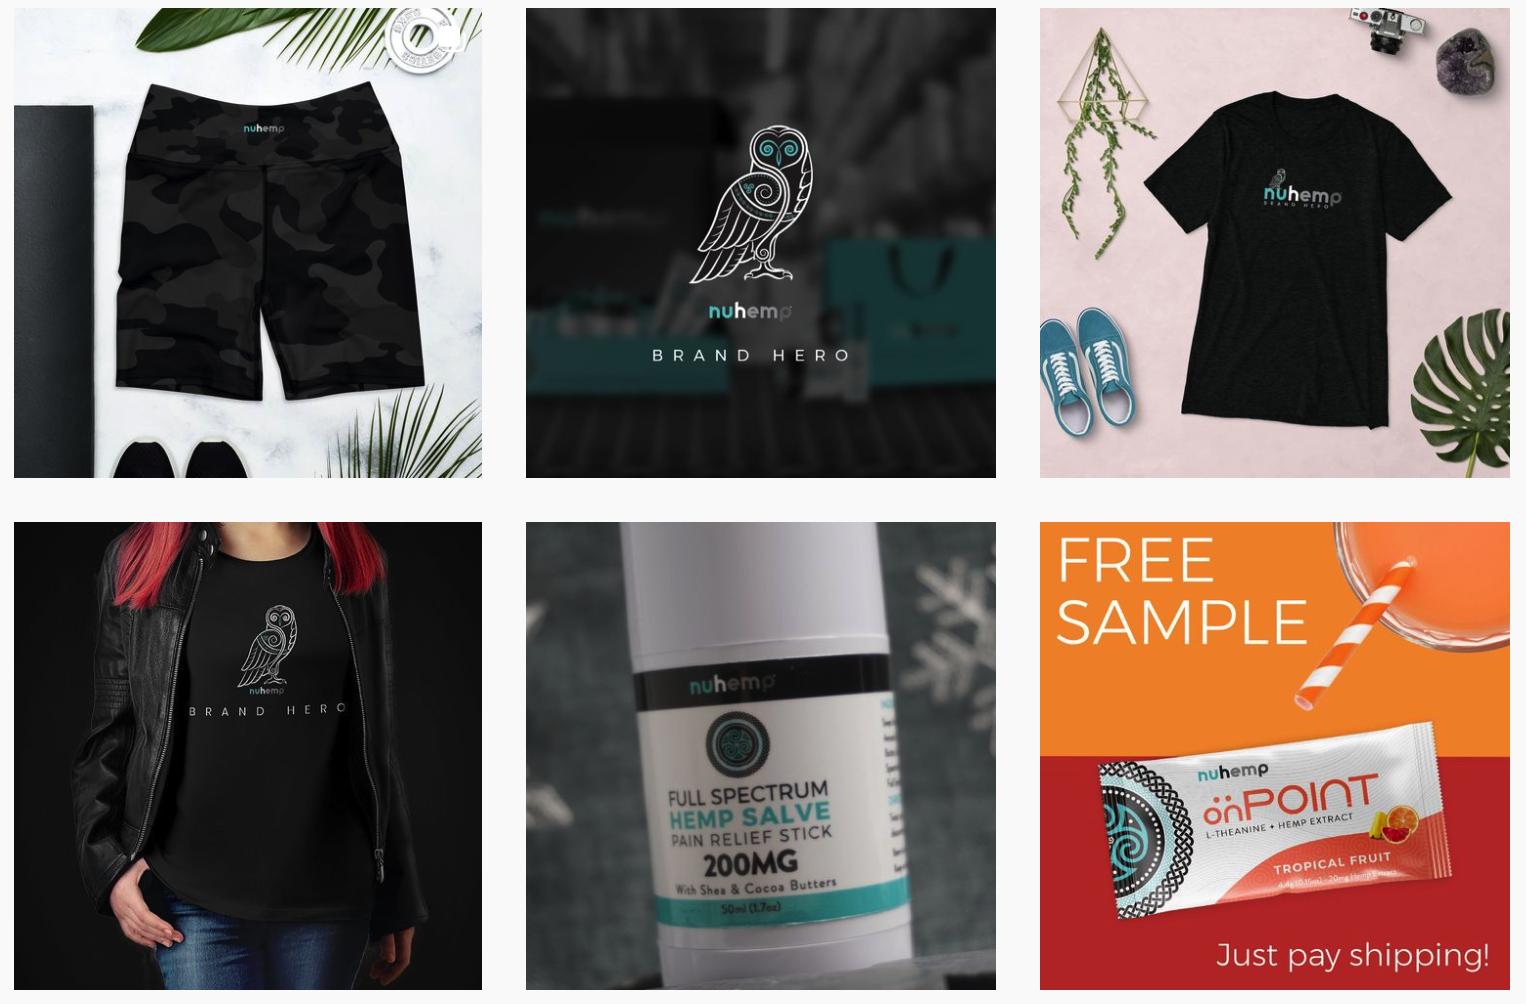 Nuhemp | Wellness Brands Featured on Afluencer